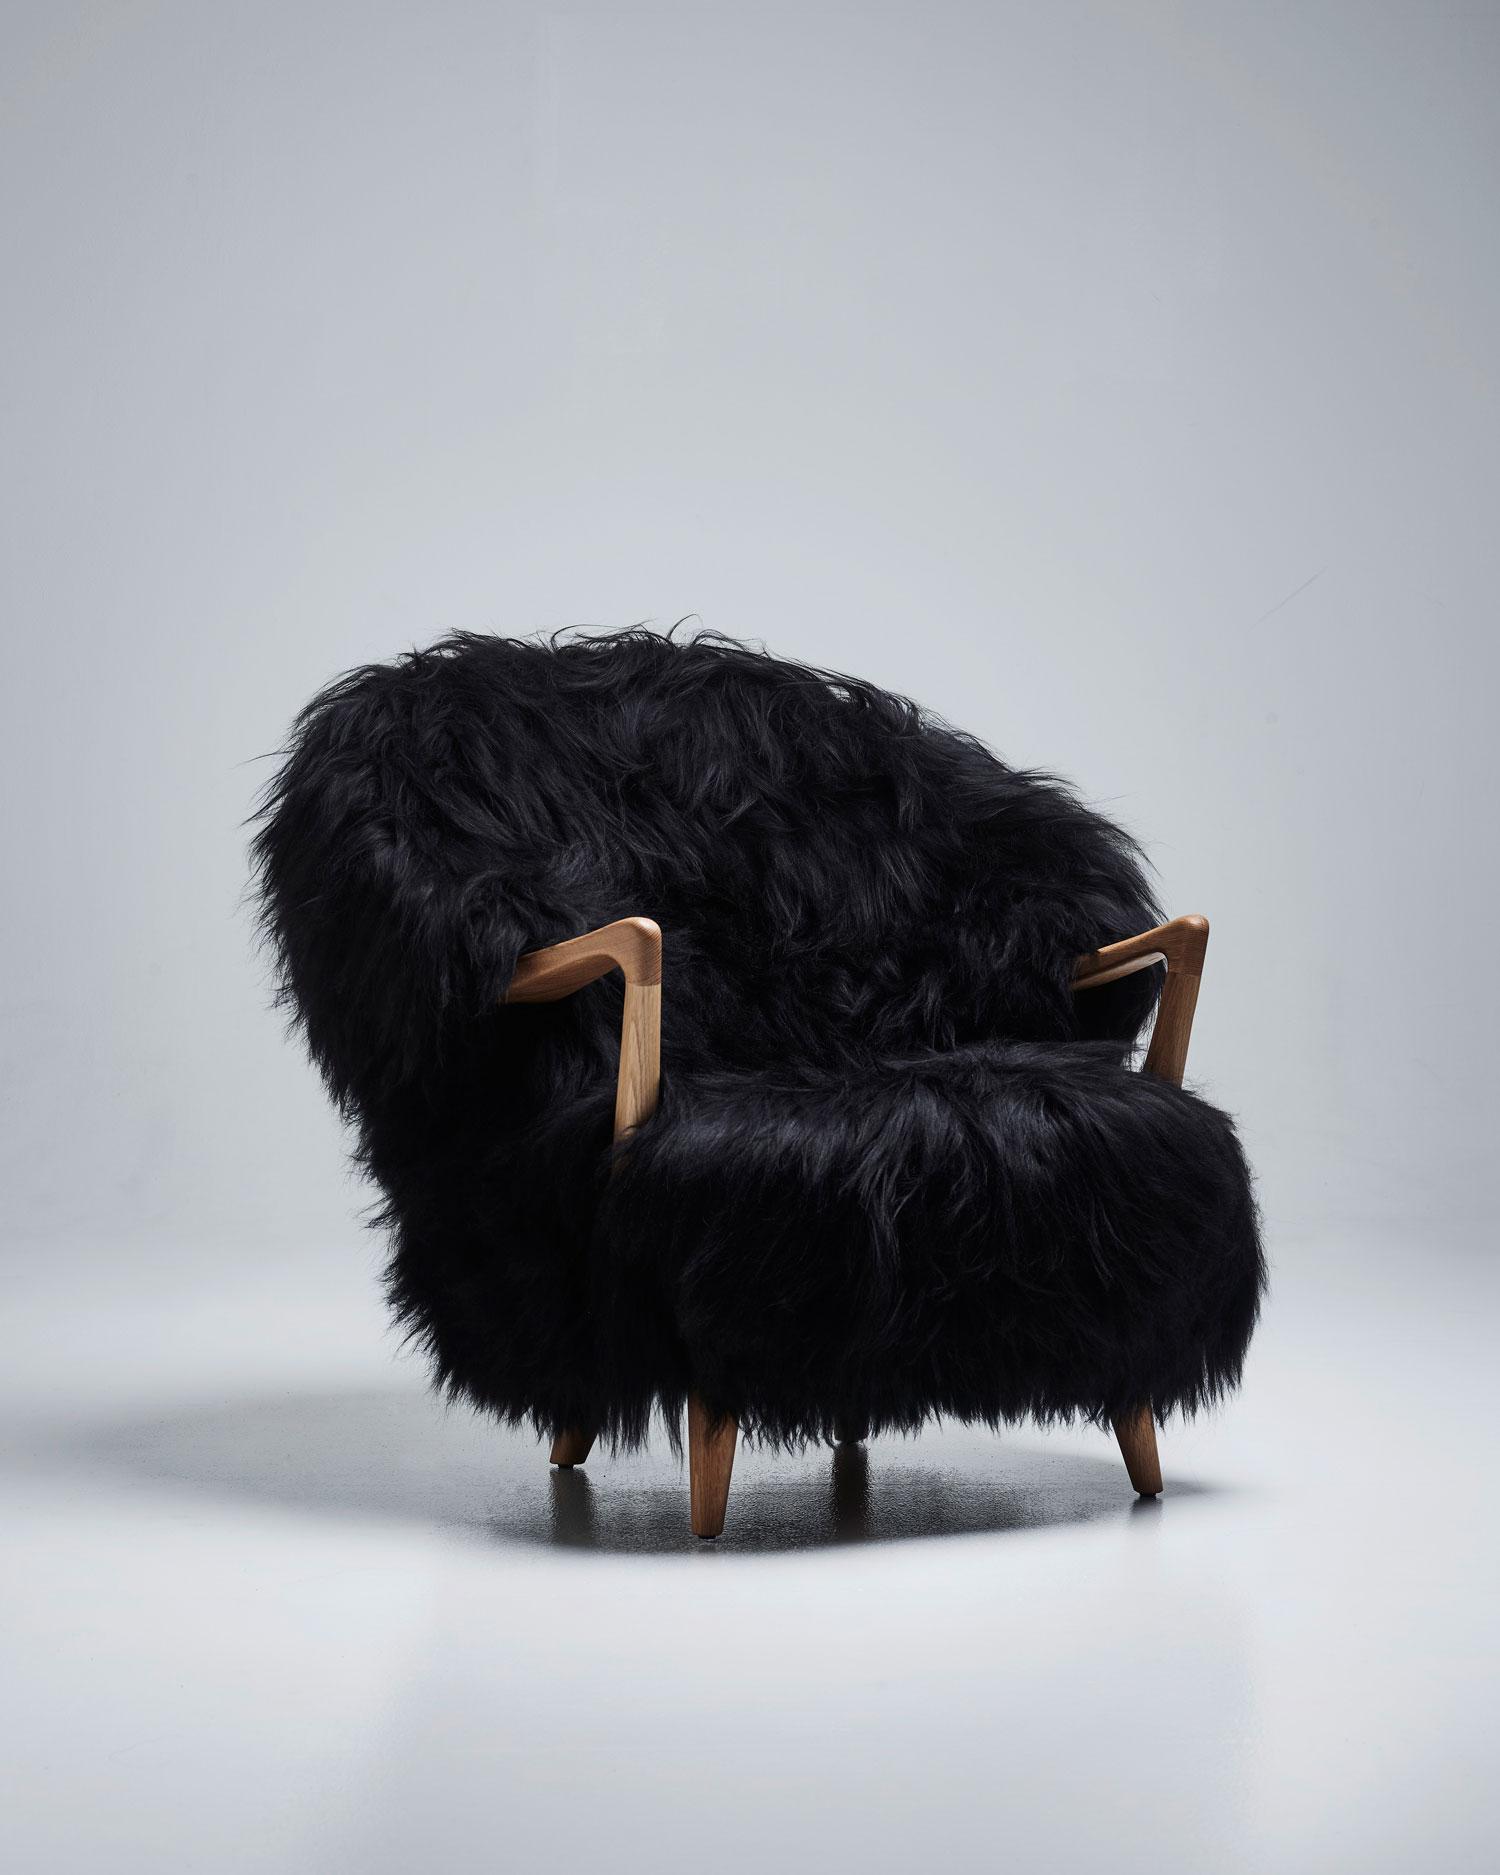 Stylecraft Eikund Fluffy Lounge Black Mid Century Design Photo Tom Haga Yellowtrace 01a